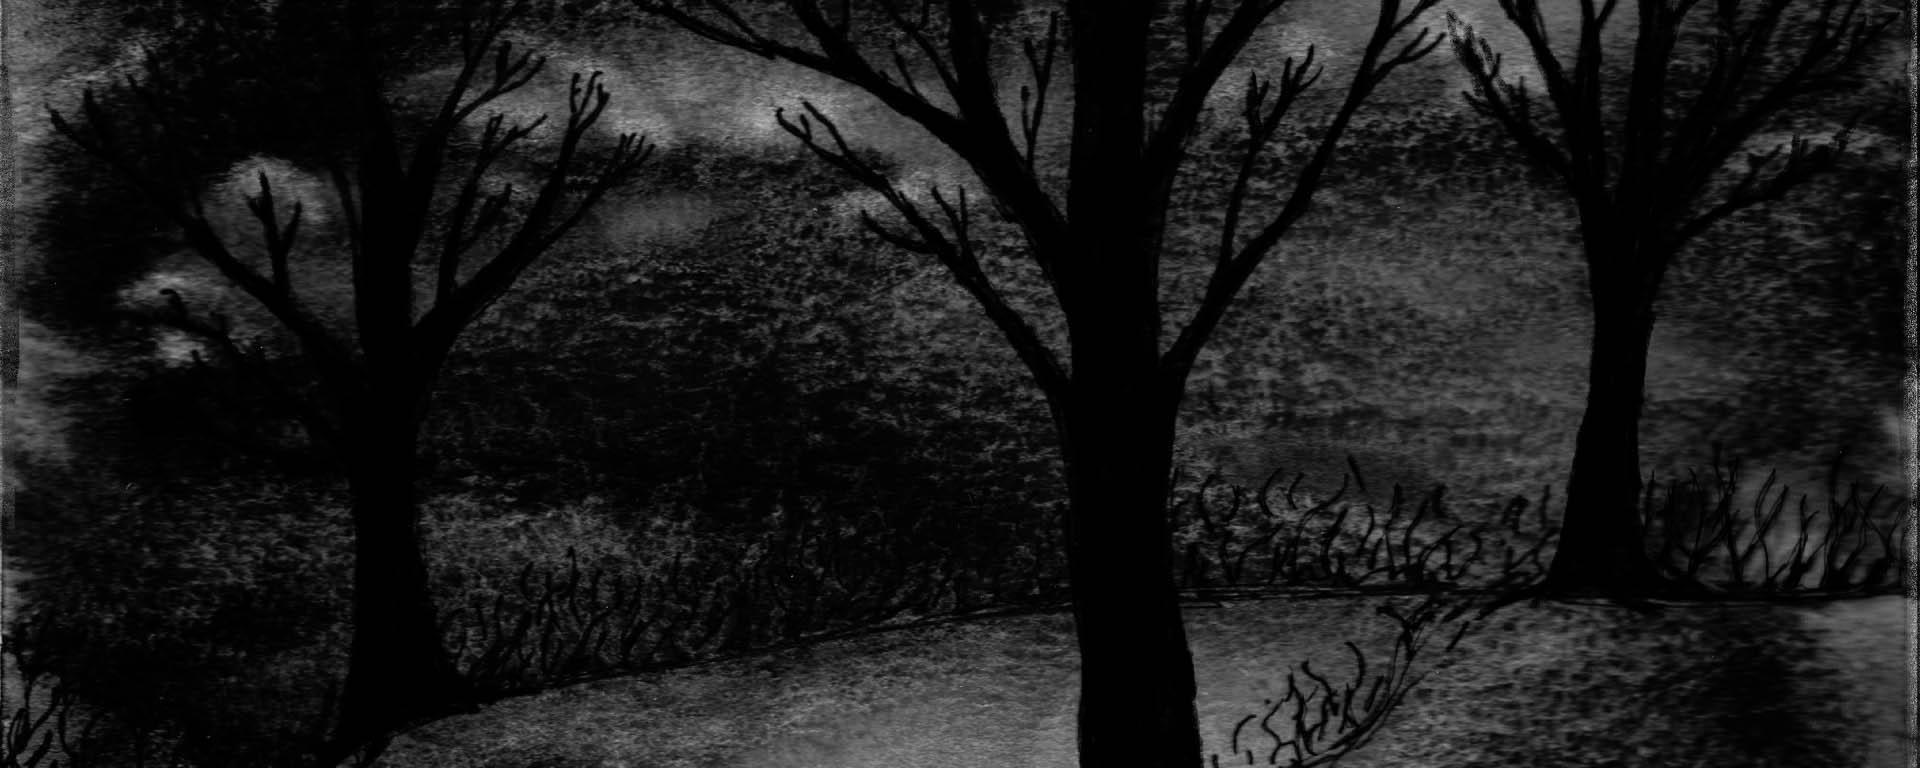 nighttime-tree-3-watermark-1920x768